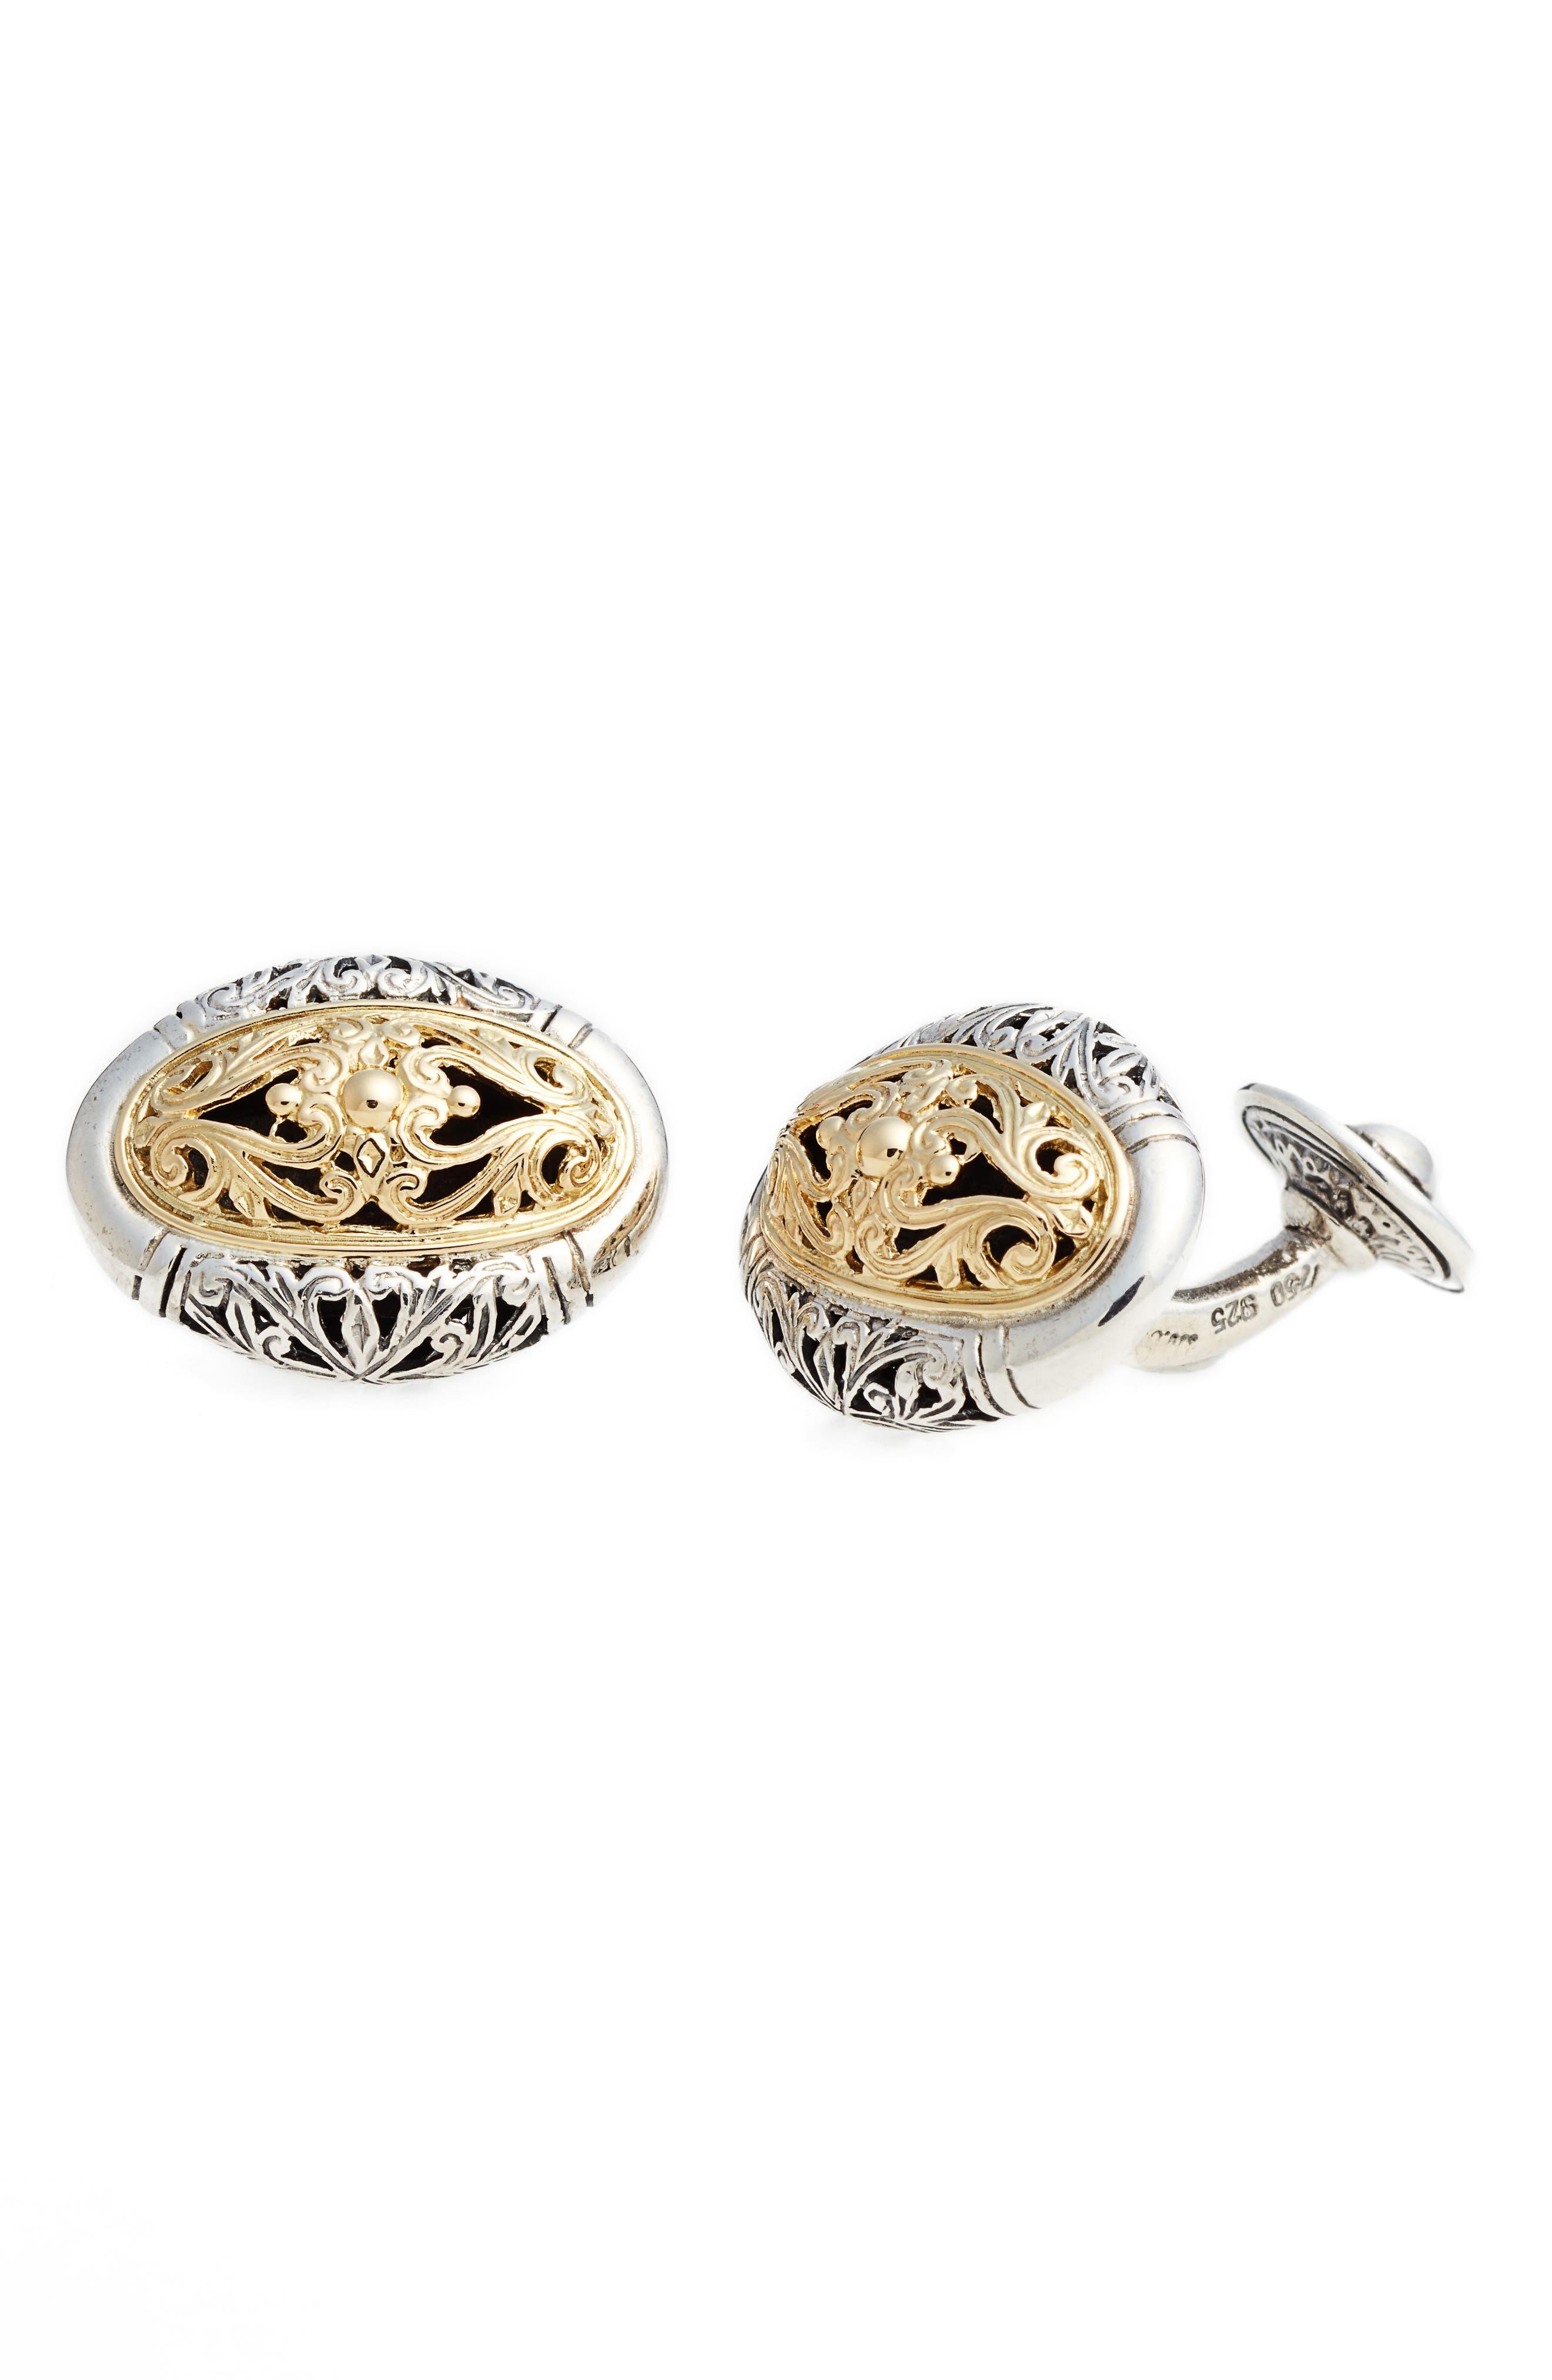 Classics Oval Cuff Links,                         Main,                         color, Silver/ Gold